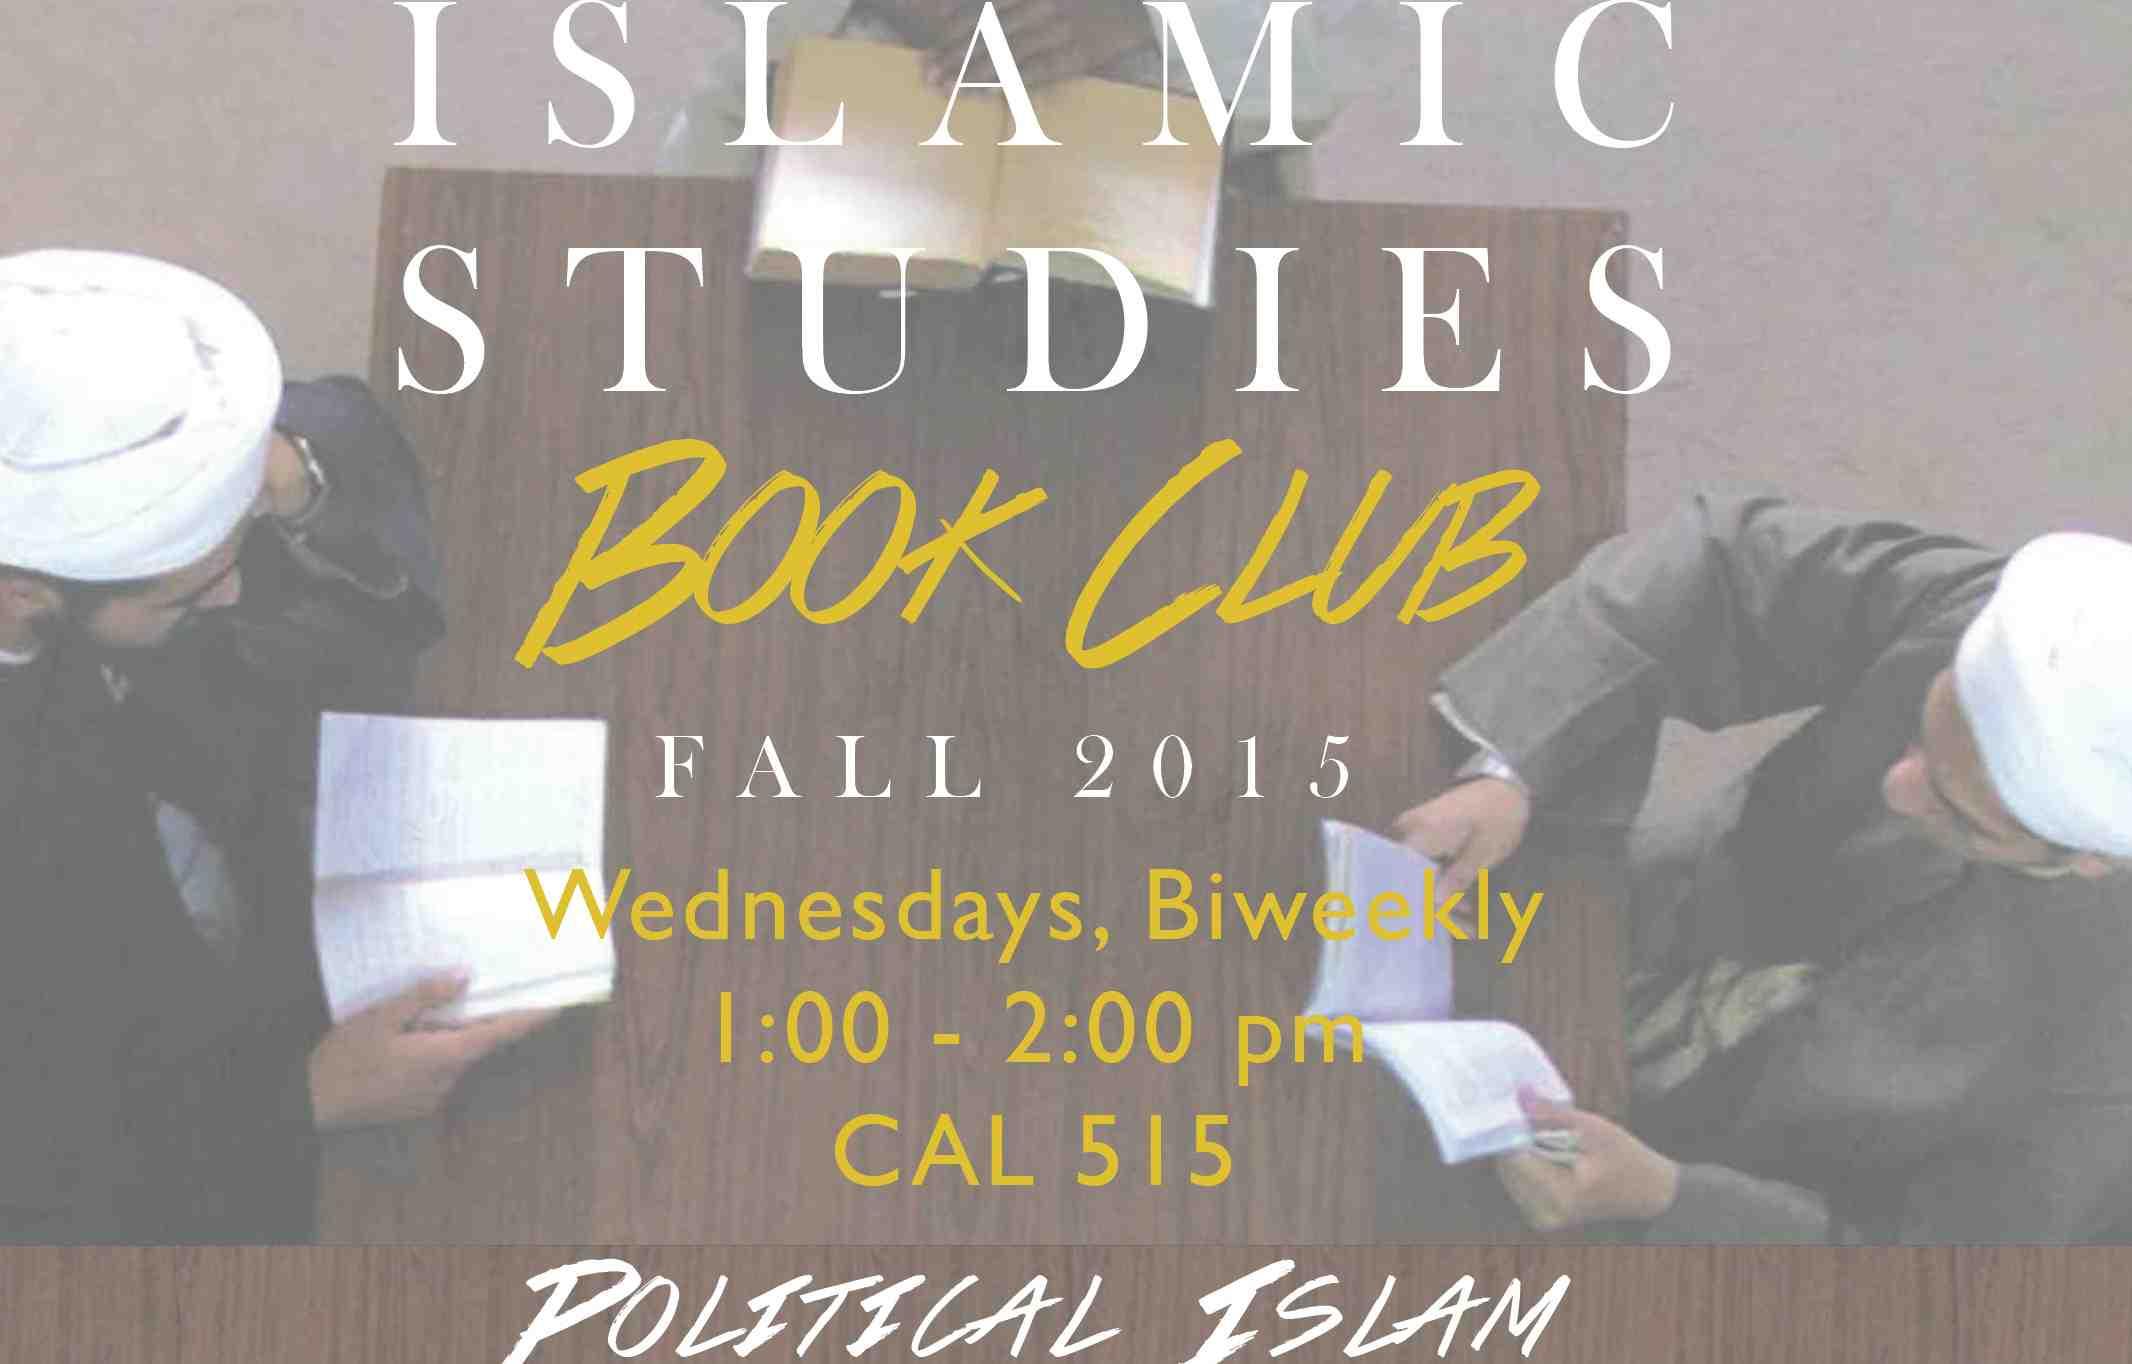 Islamic Studies Book Club